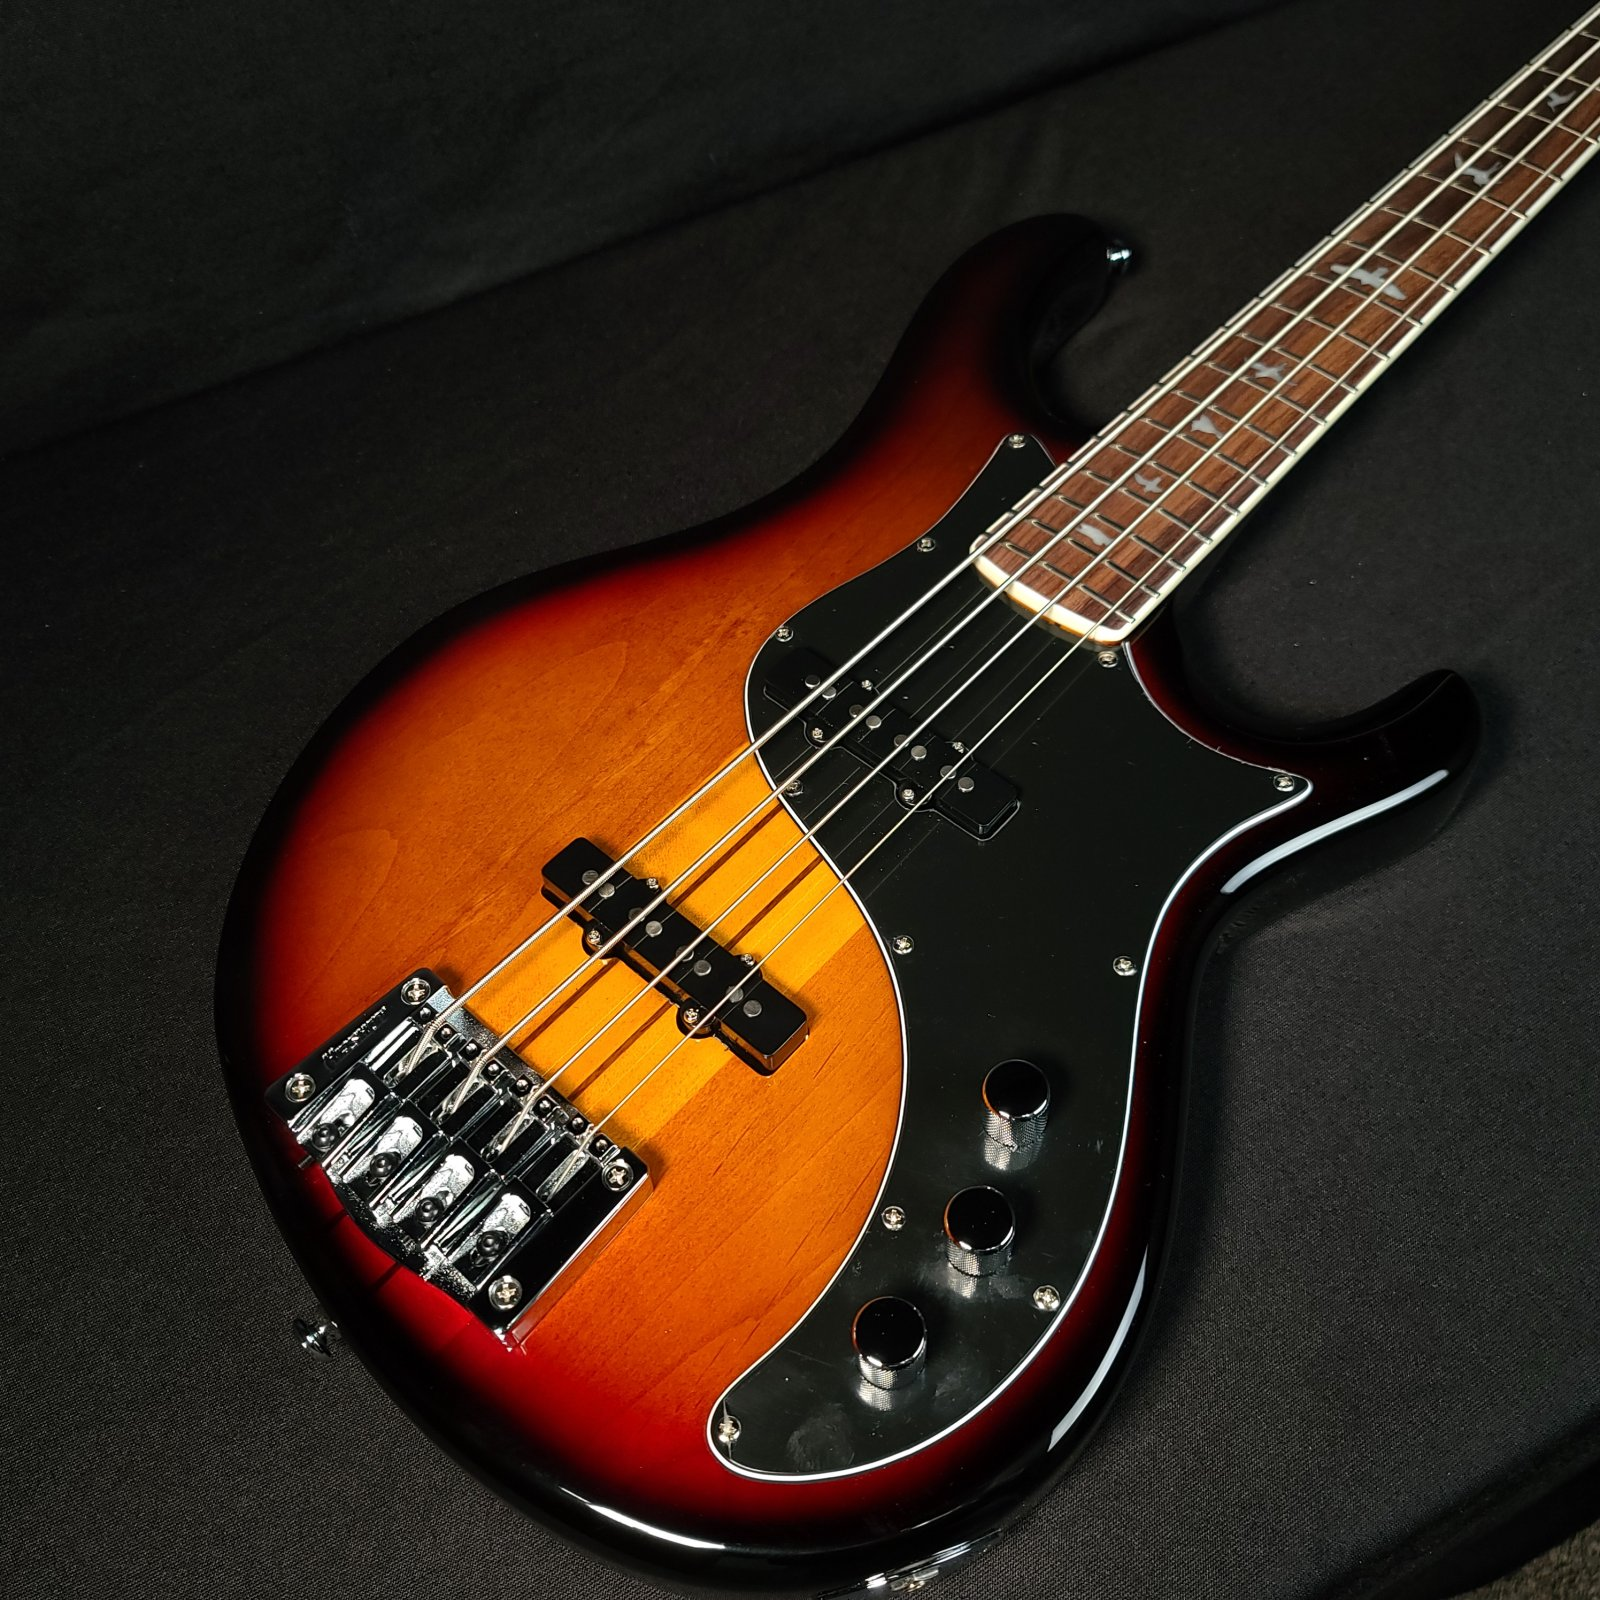 Paul Reed Smith PRS SE Kestrel Sunburst Neck Through 4 String Bass with Gig Bag